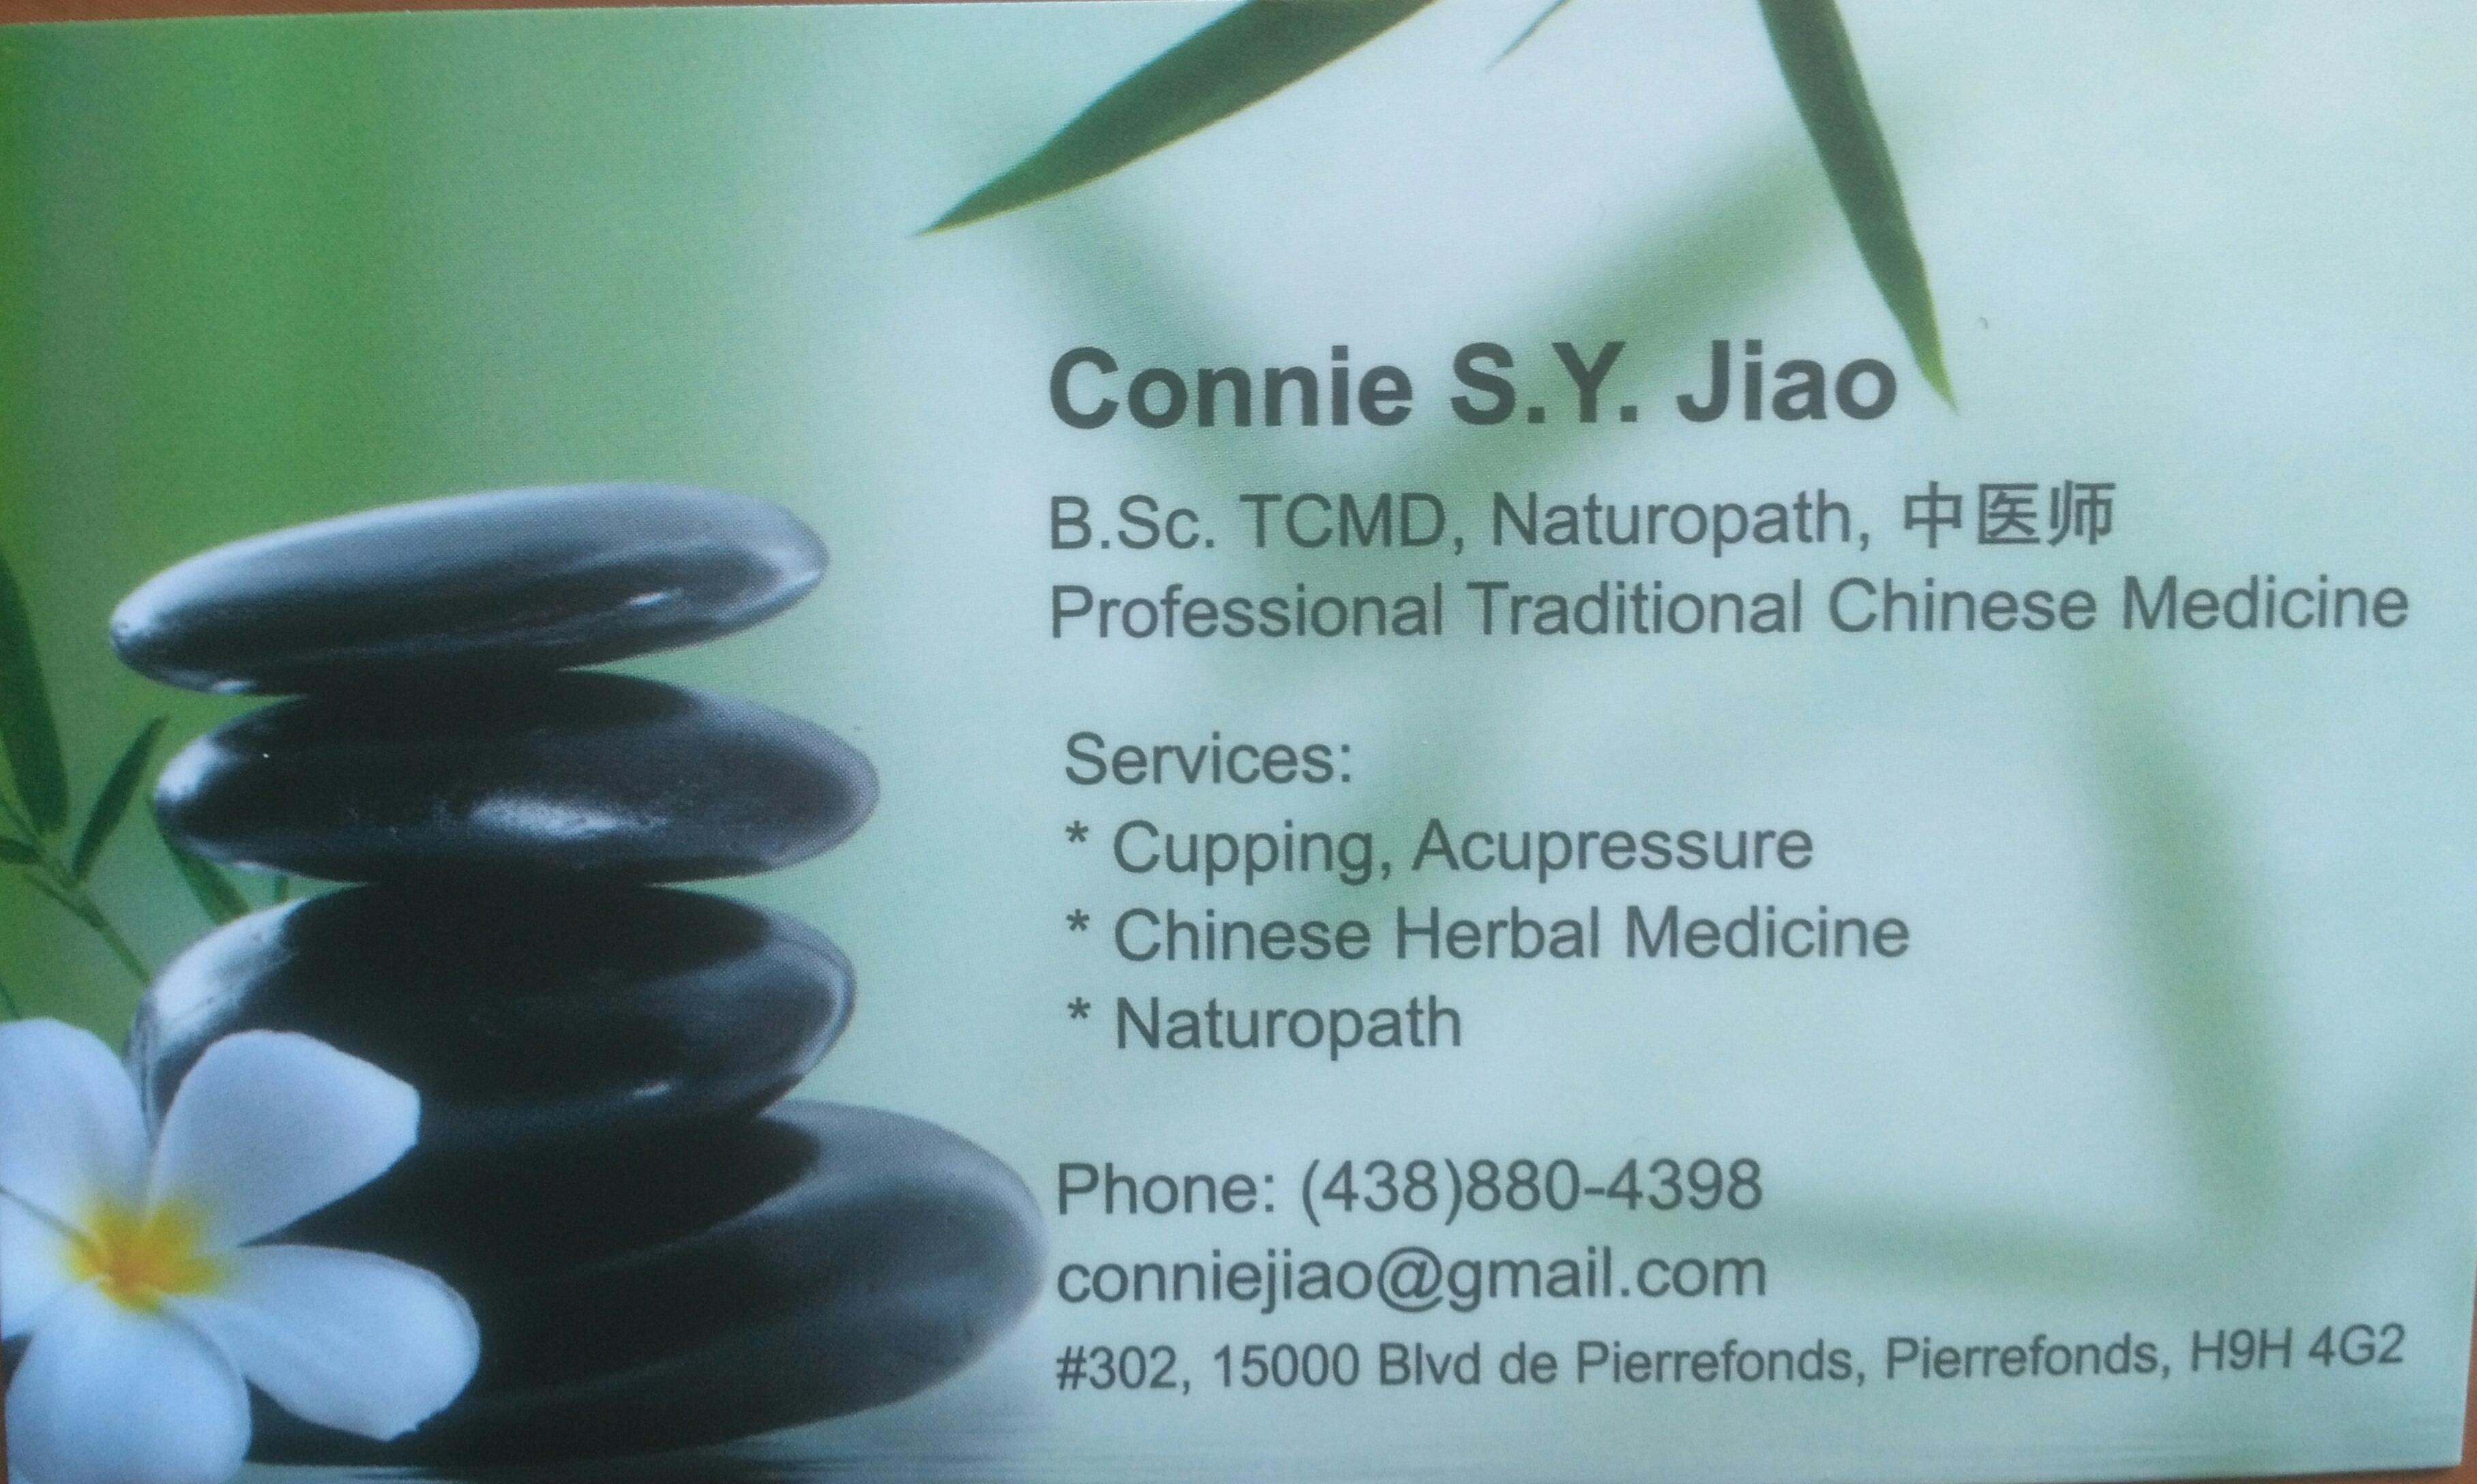 Connie S.Y. Jiao